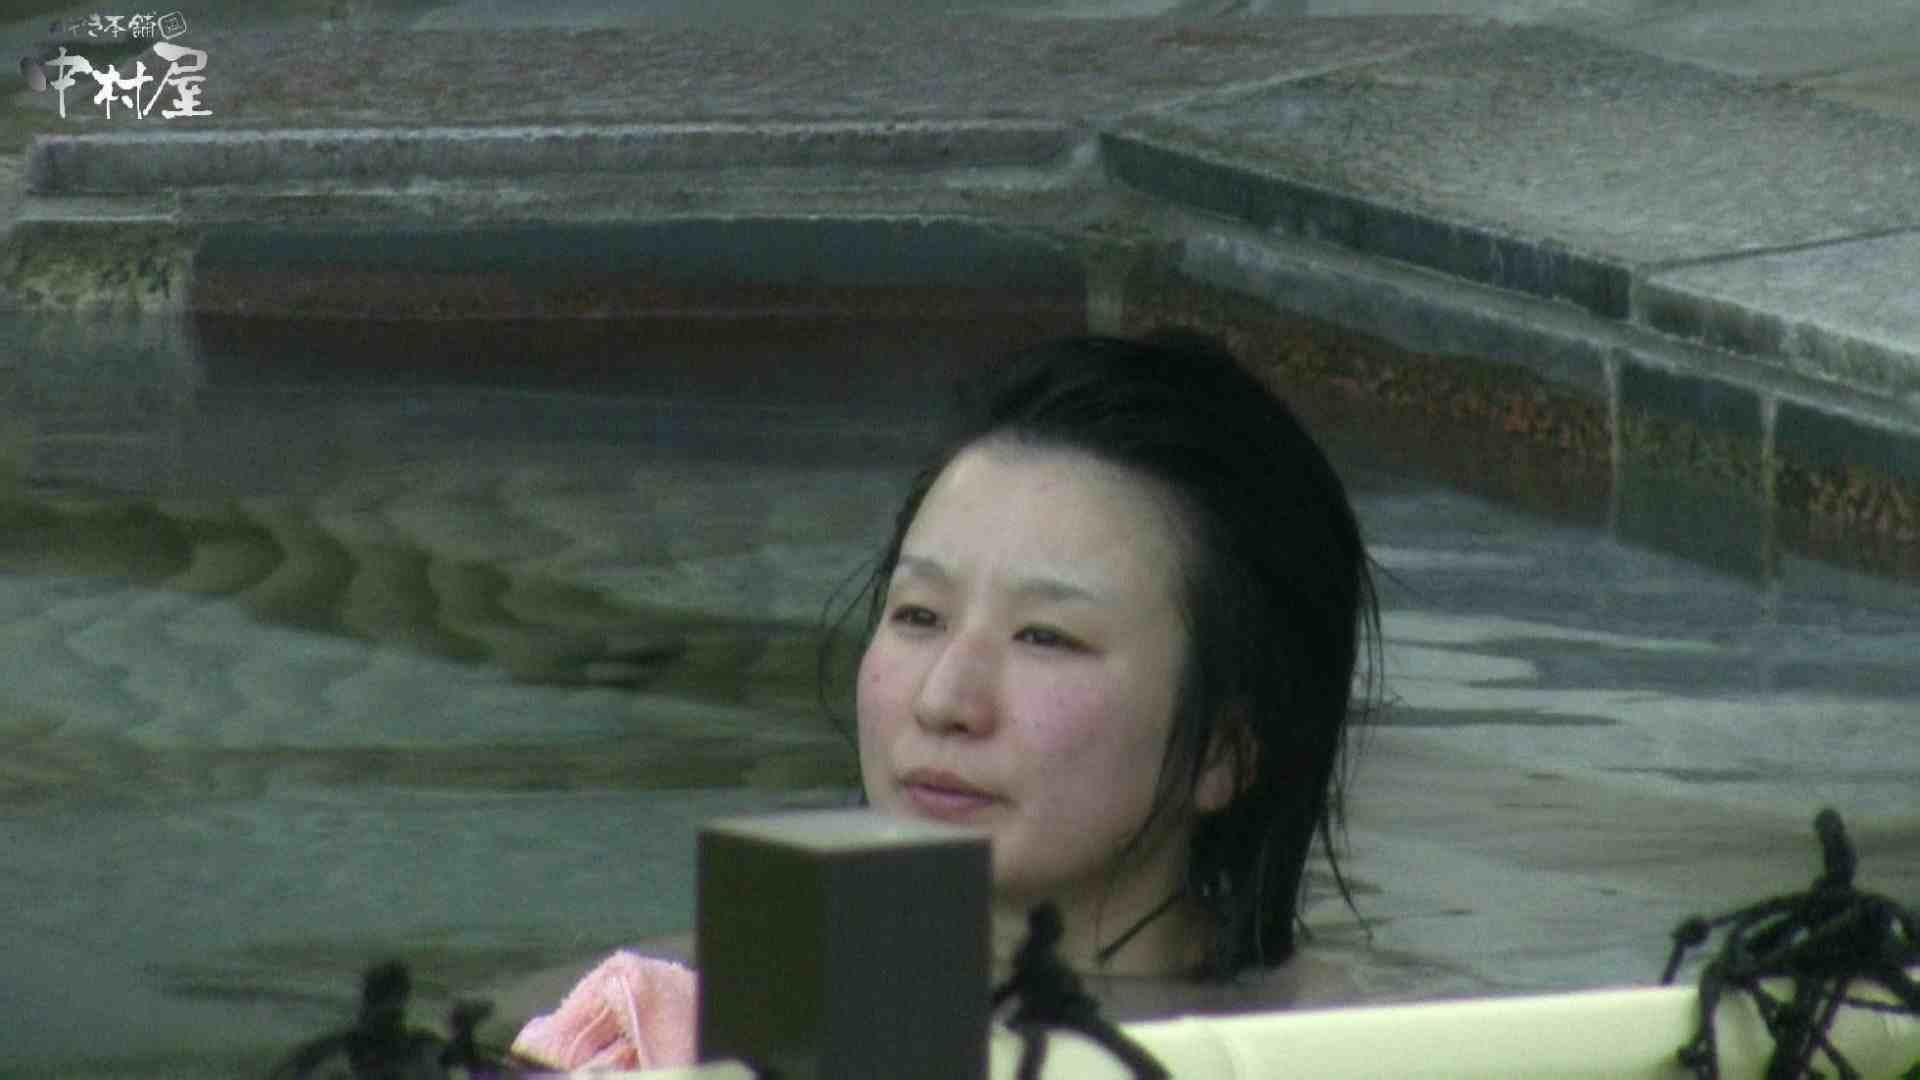 Aquaな露天風呂Vol.982 露天風呂編  78PIX 42